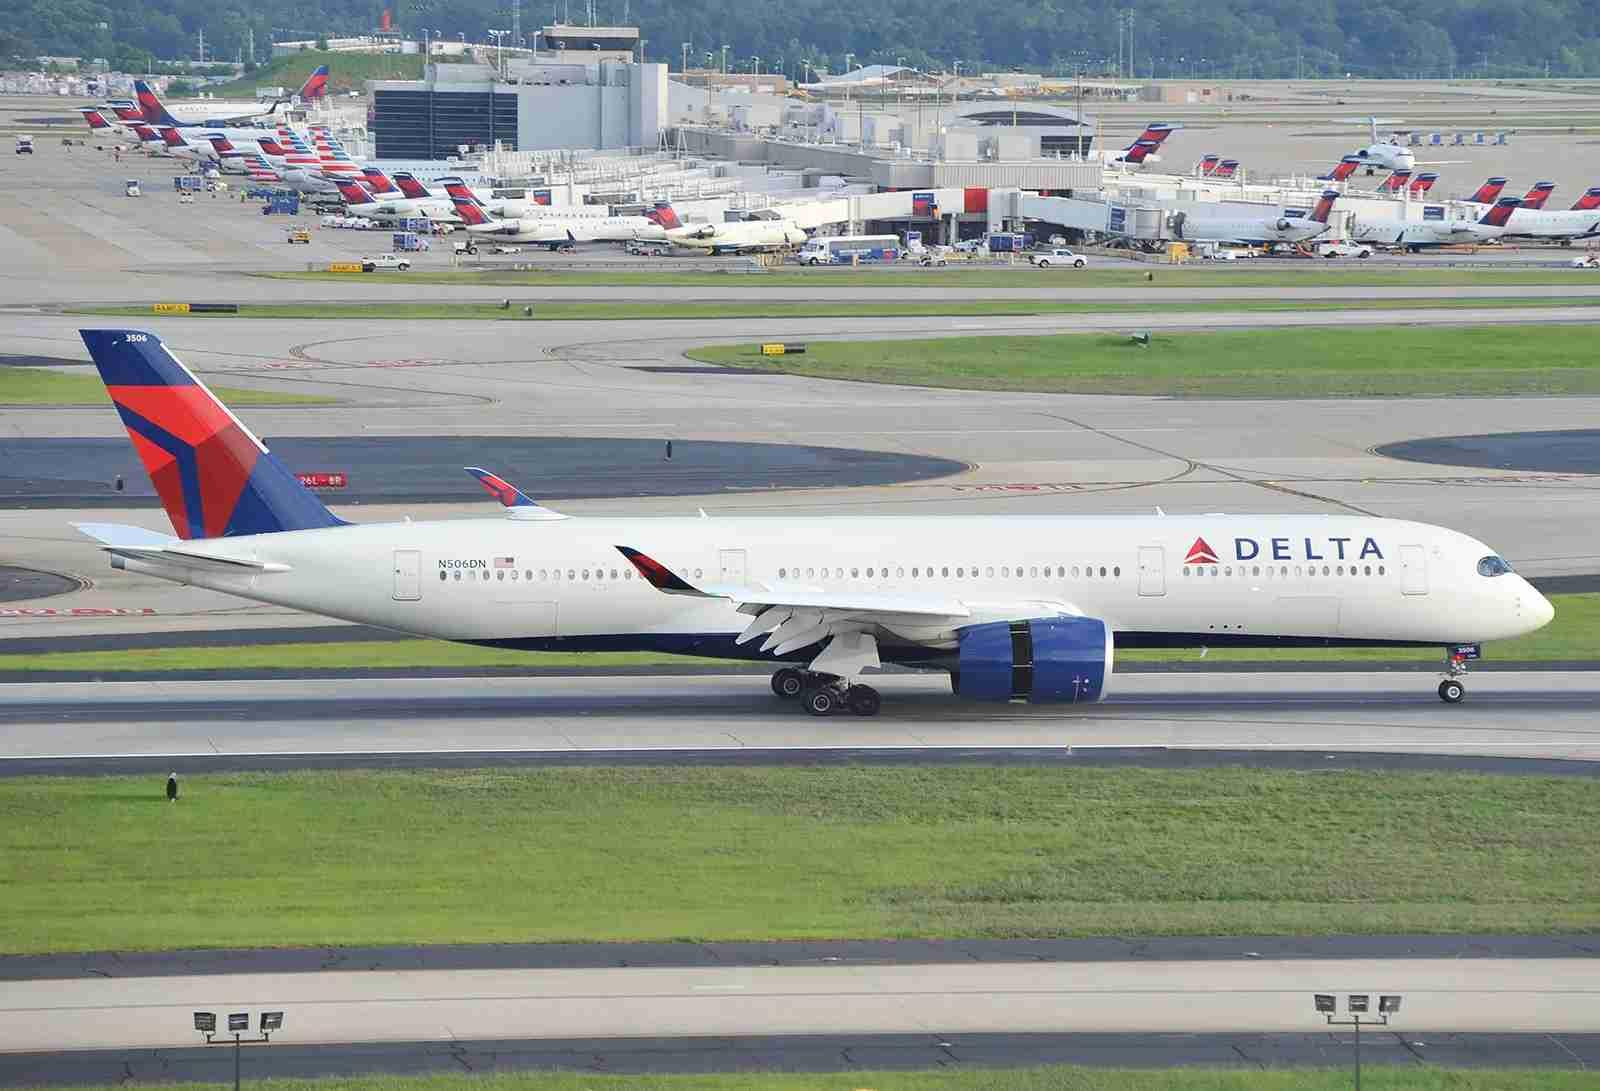 A Delta Airbus A350 at ATL (Photo by Alberto Riva/TPG)